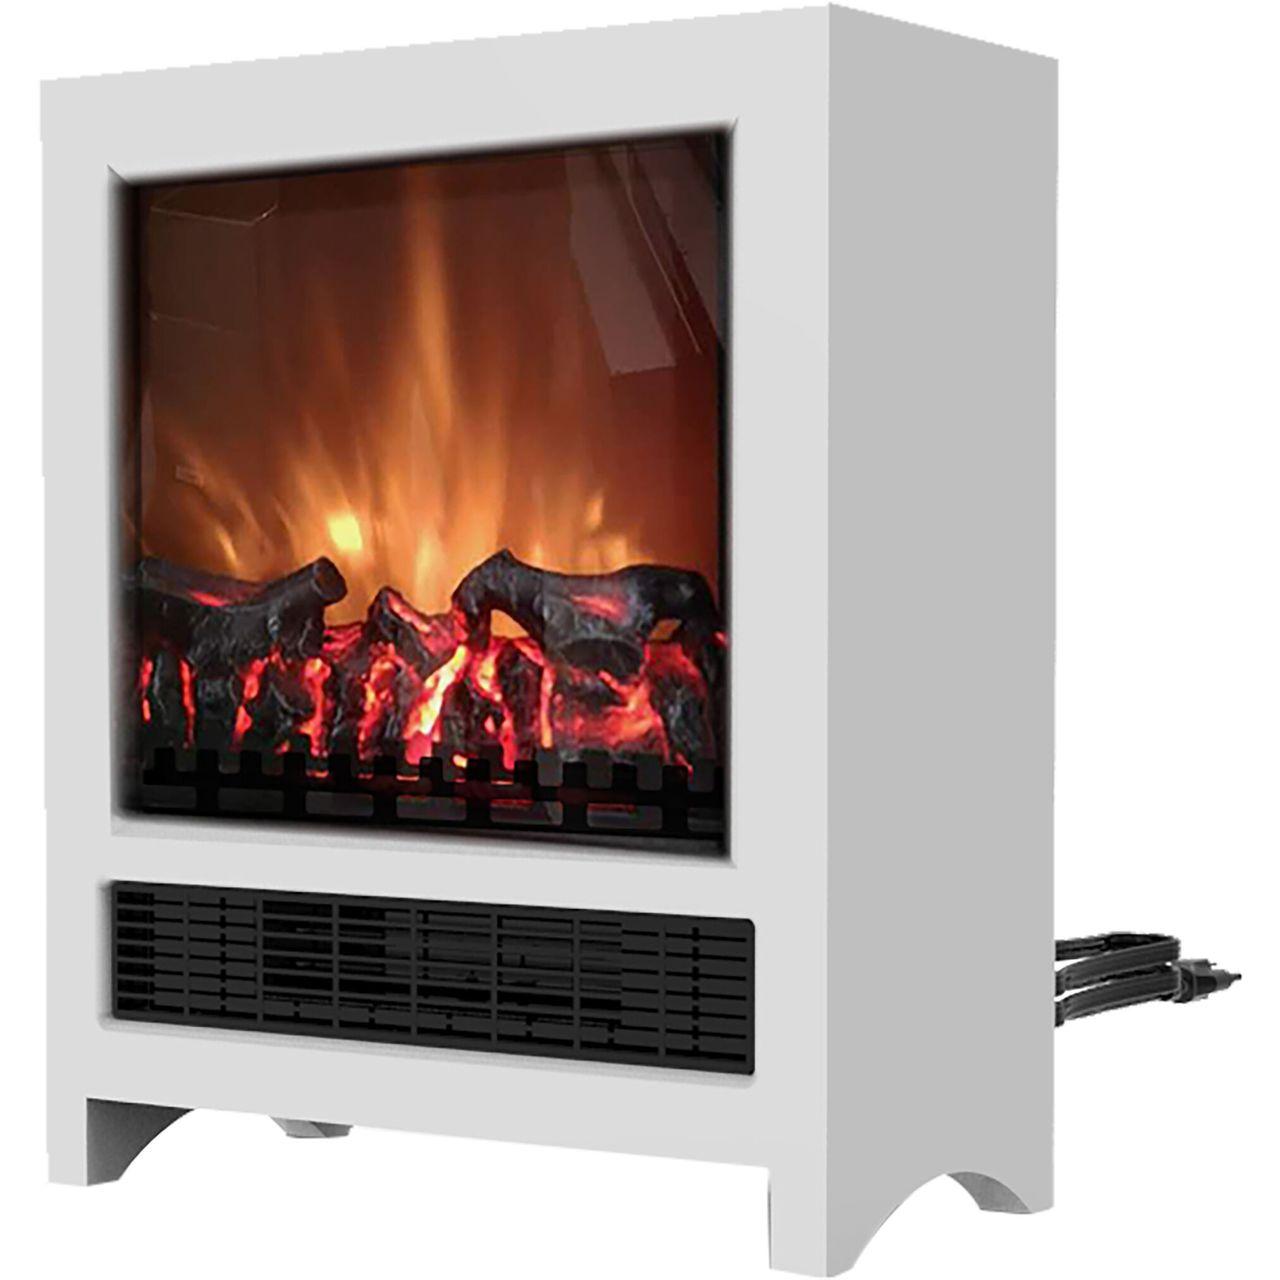 "Cambridge 19"" Freestanding 4606 BTU Electric Fireplace - White"